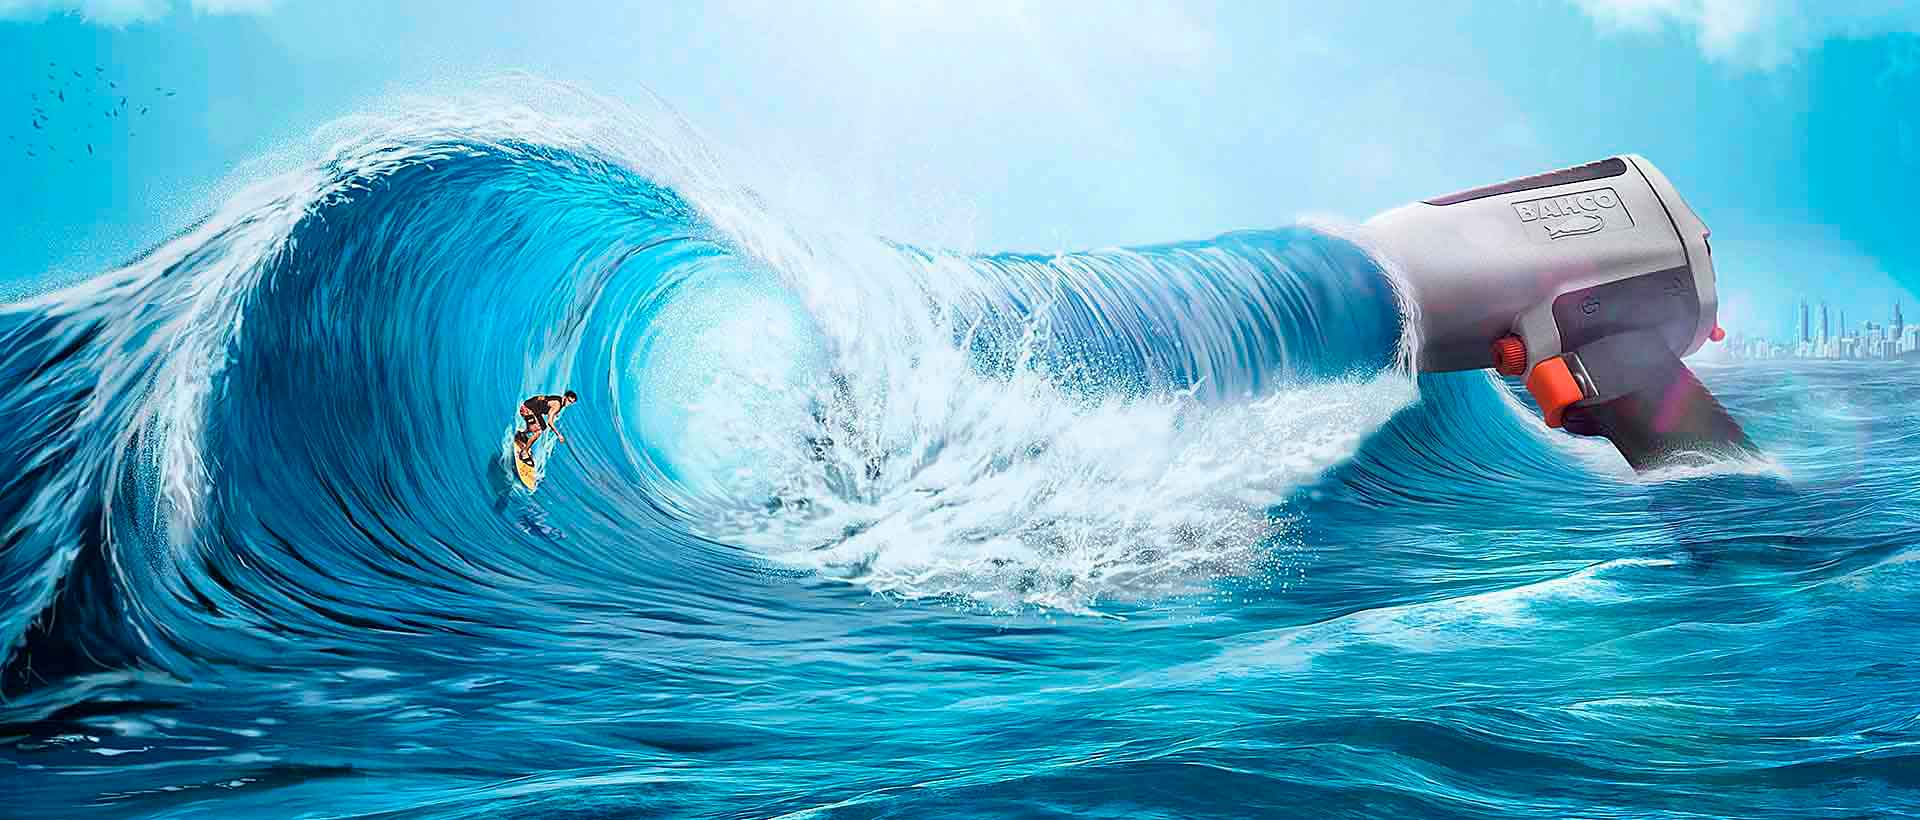 Surfer Ola  - Bahco